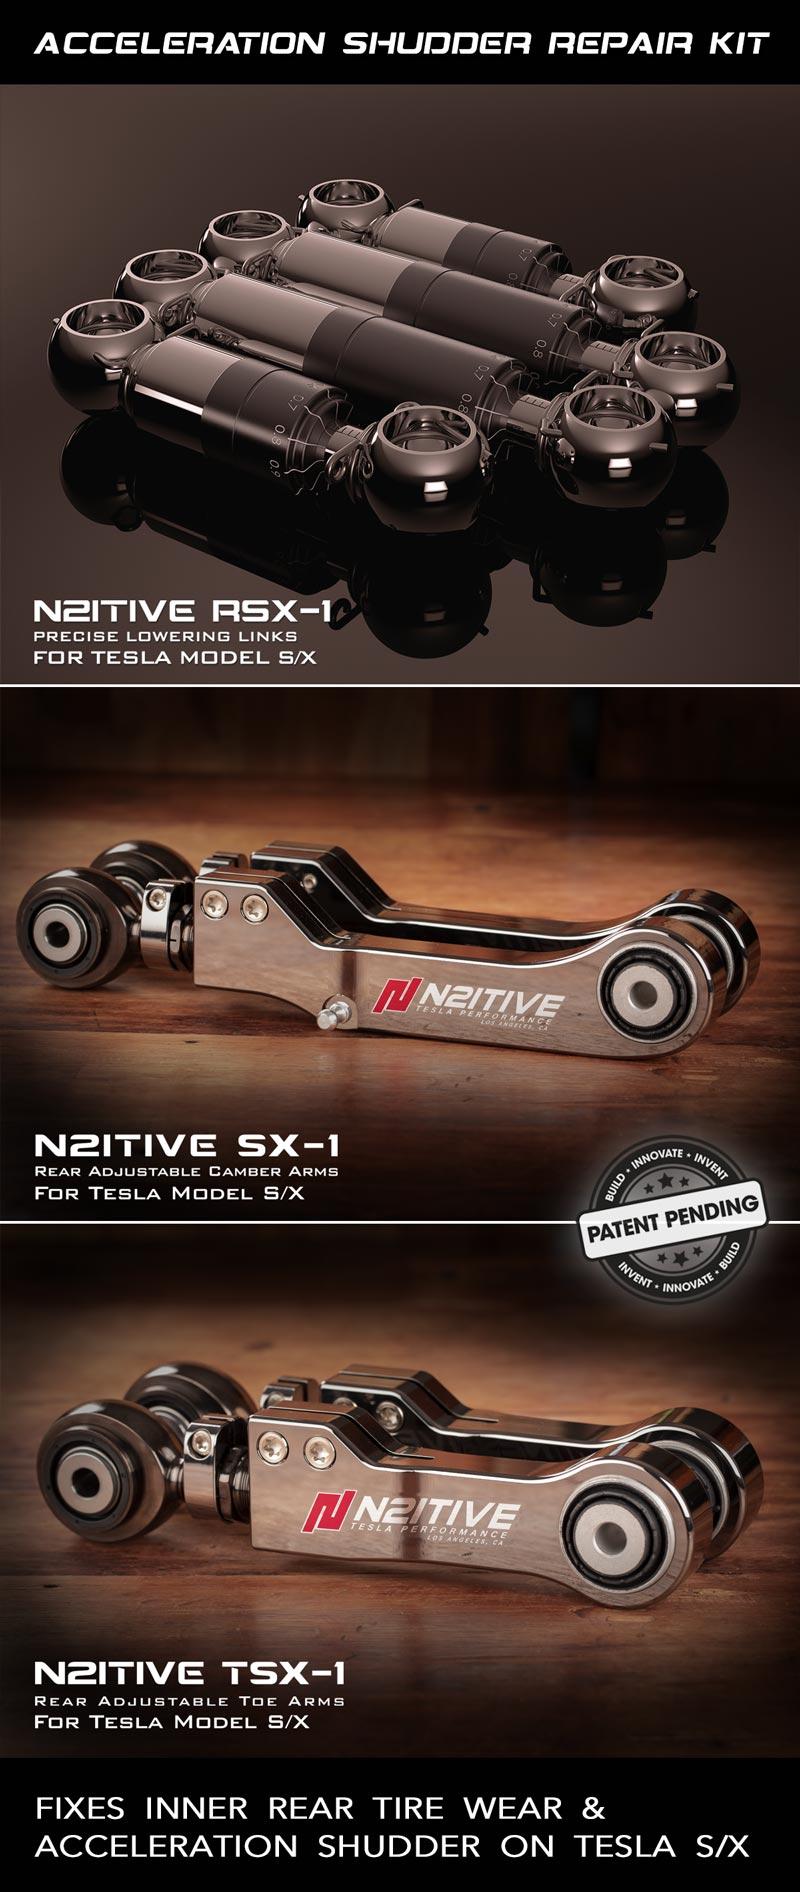 N2itive Acceleration Shudder Repair Kit For Tesla S/X - Black